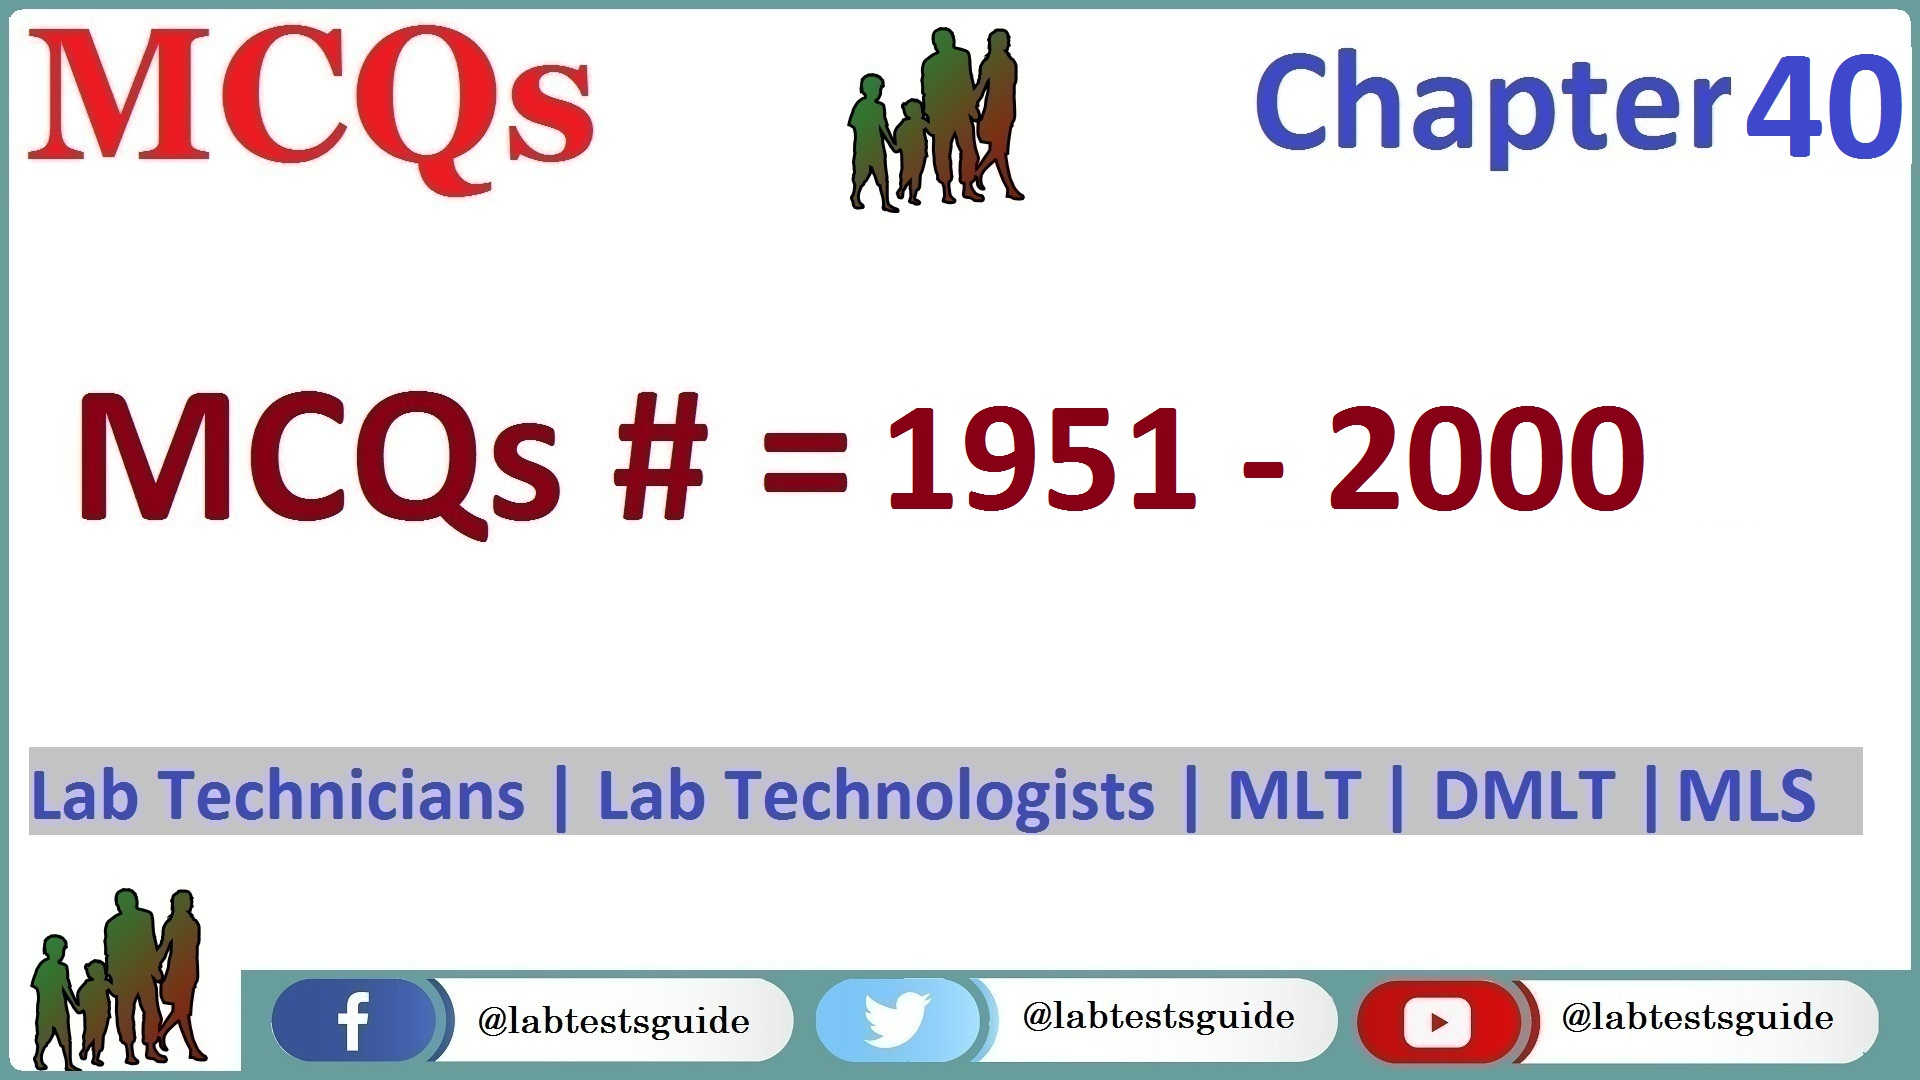 MCQs Chapter 40